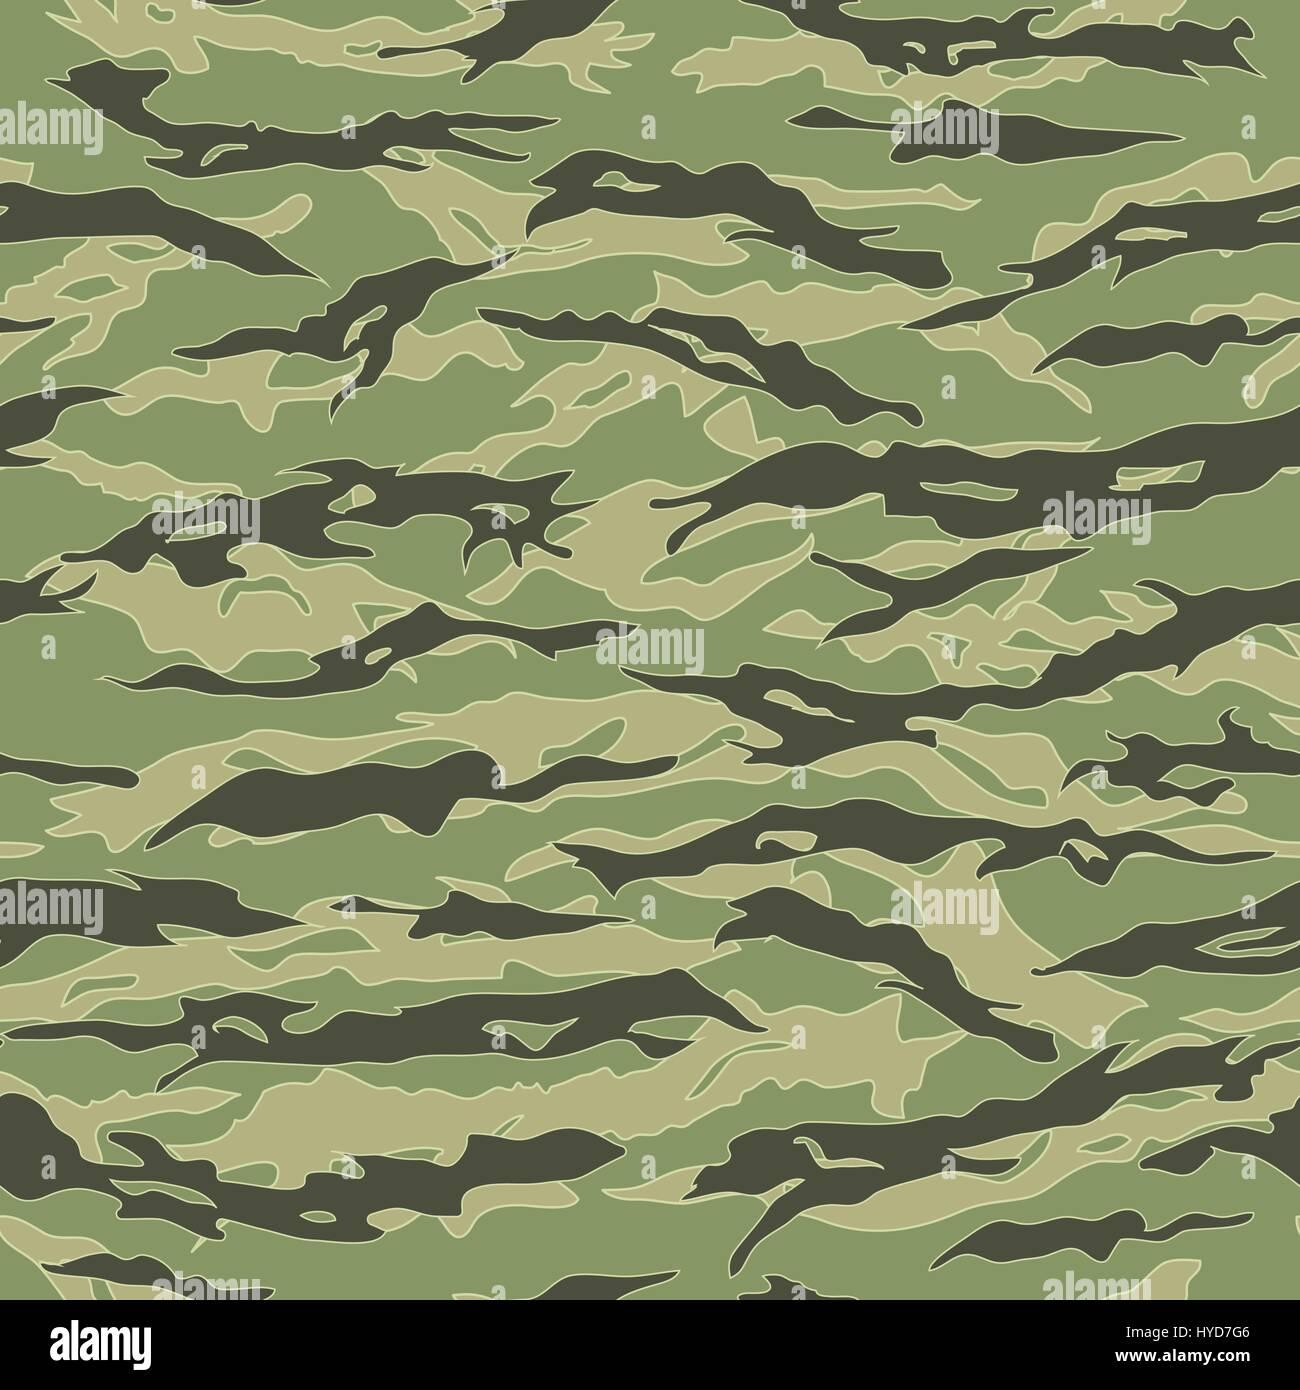 Vietnam Tiger stripe Camouflage seamless patterns Stock Vector